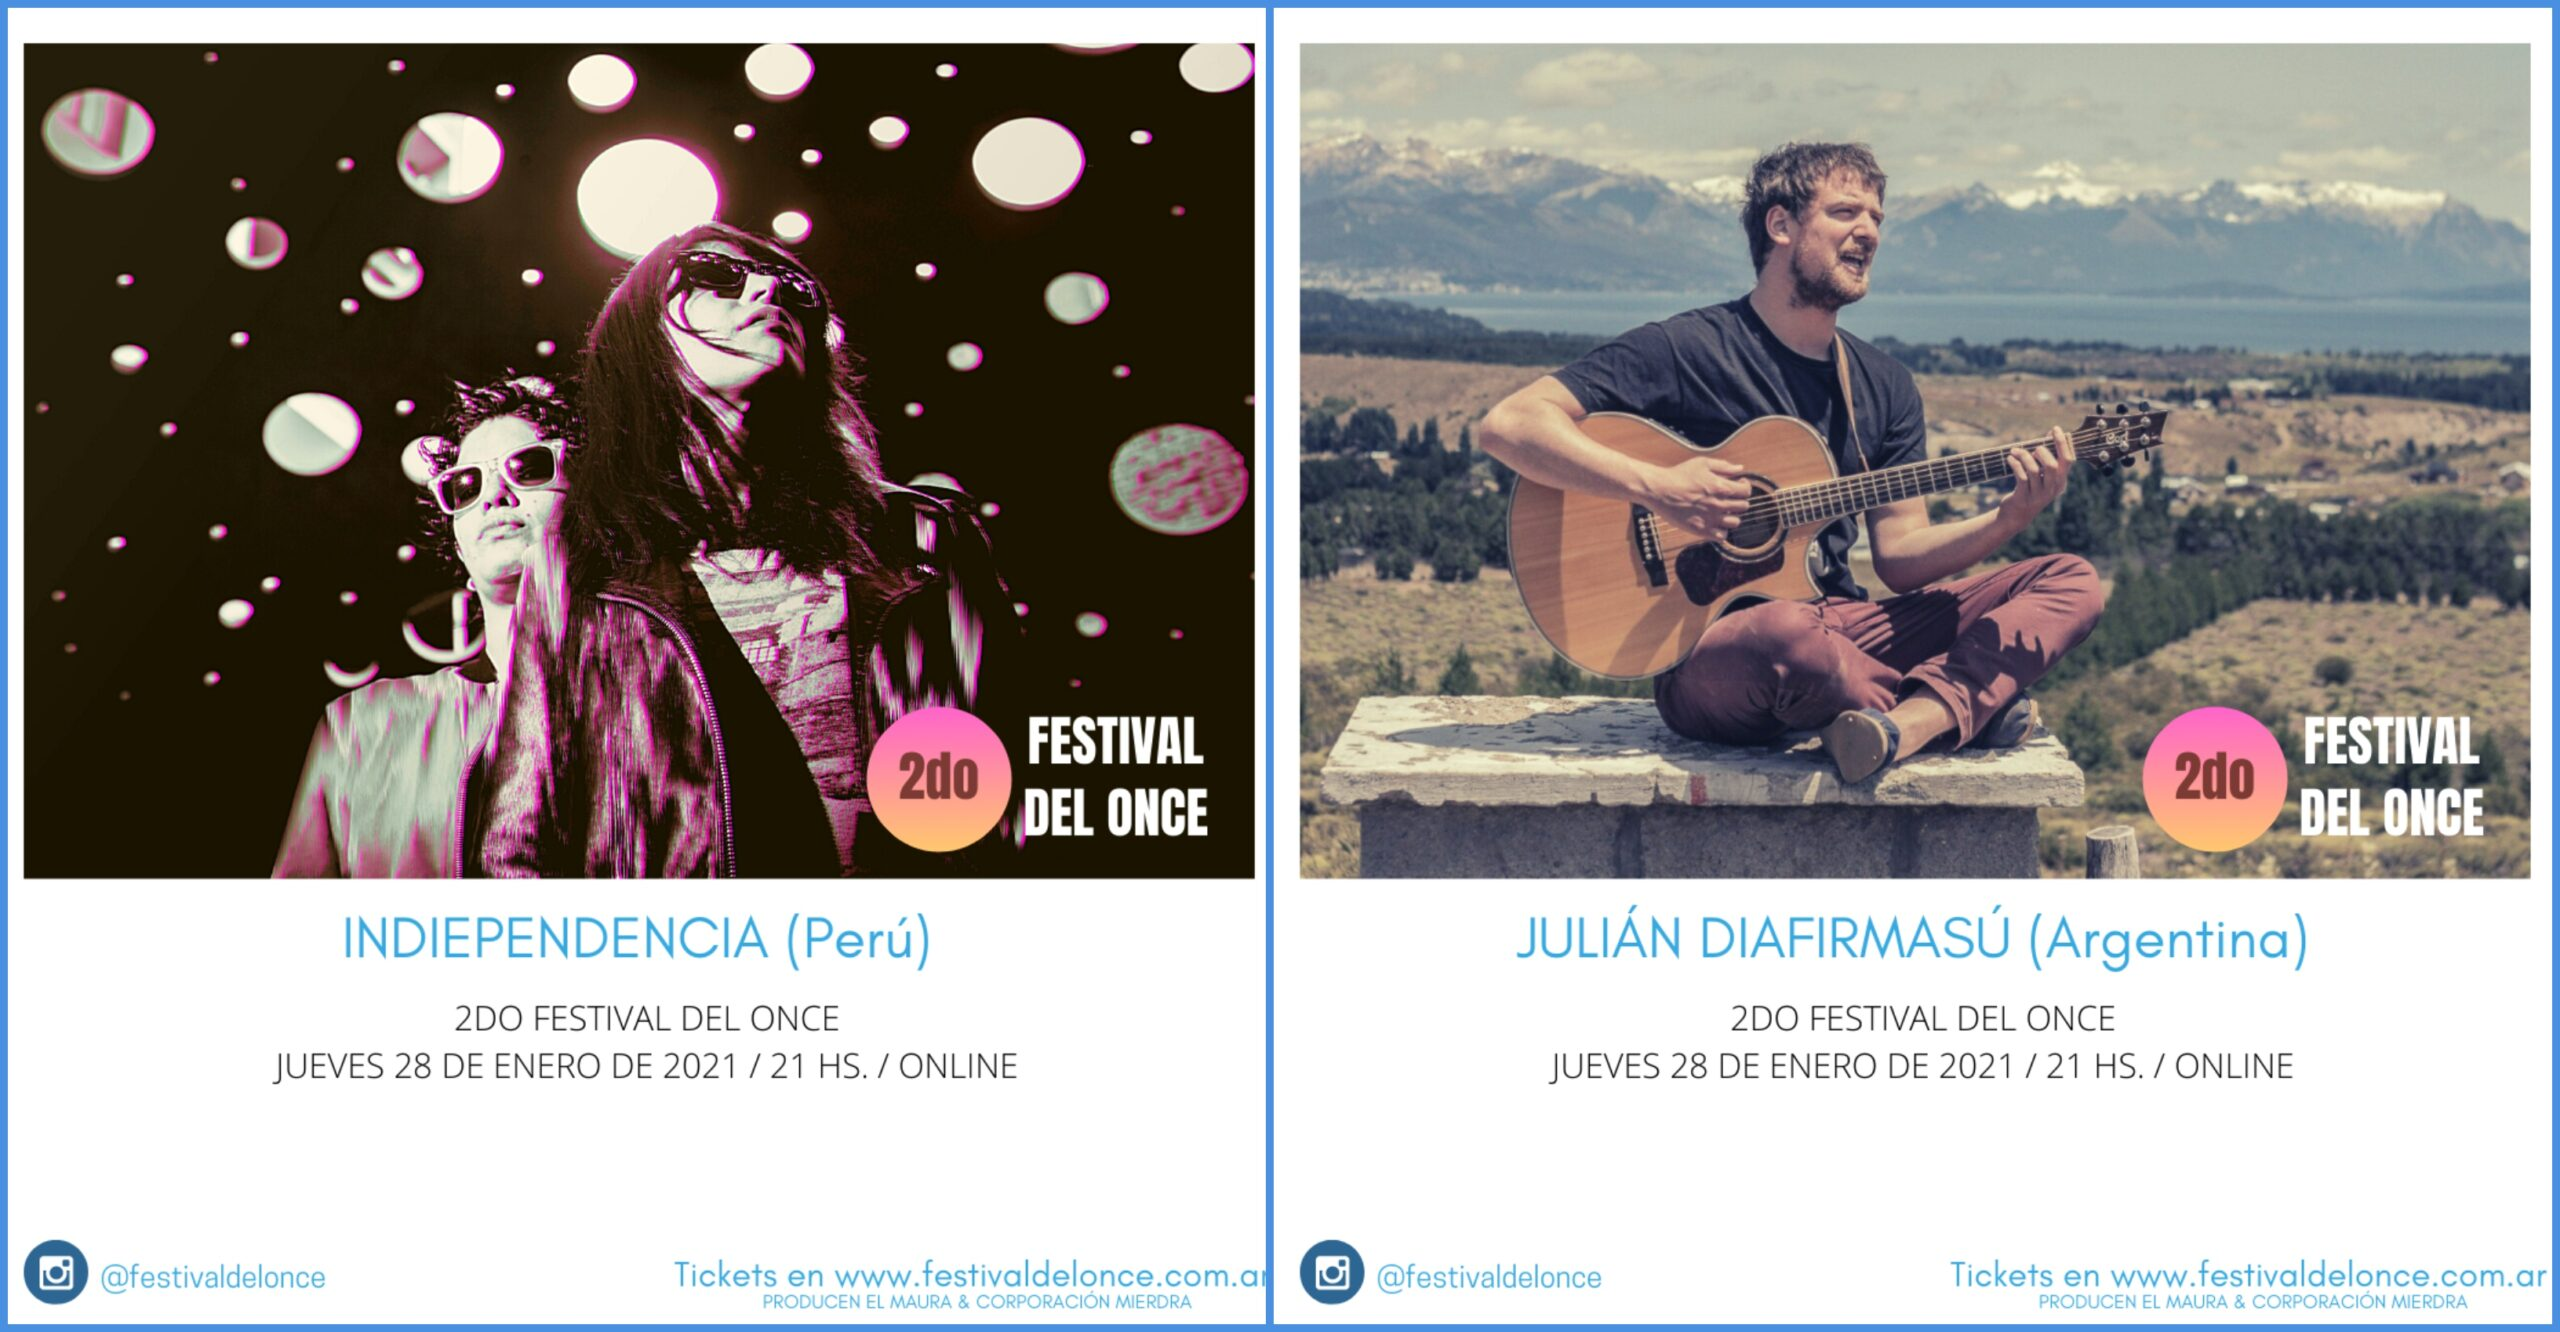 Festival del Once - Indiependencia - Julián Diafirmasú - OYR